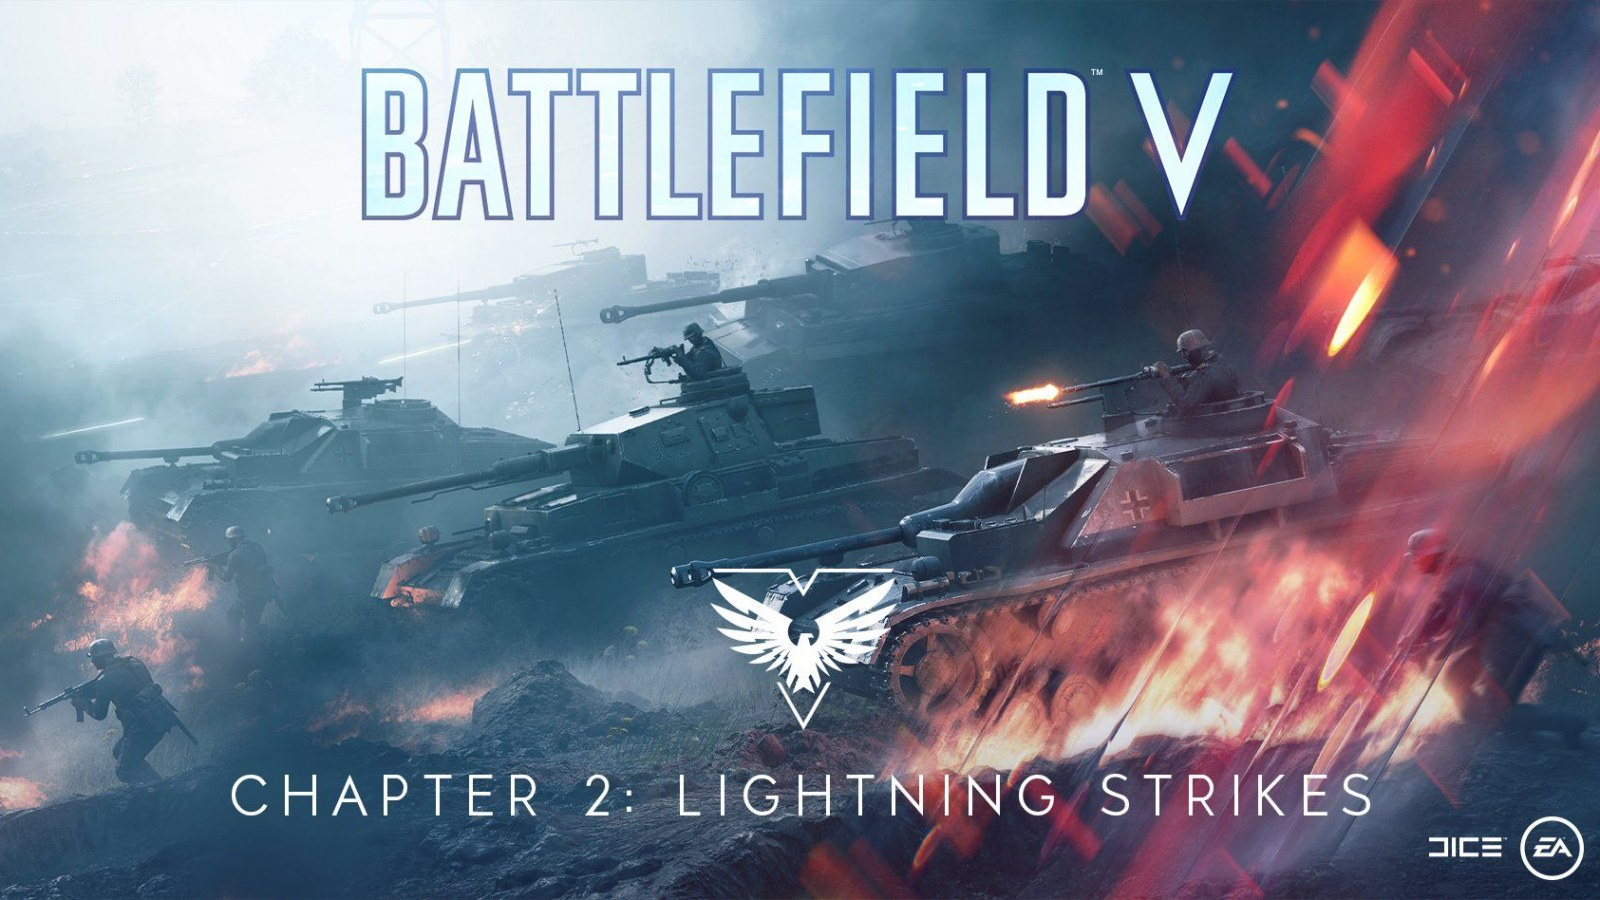 Battlefield 5' Update 1 07 Adds Lightning Strikes DLC for